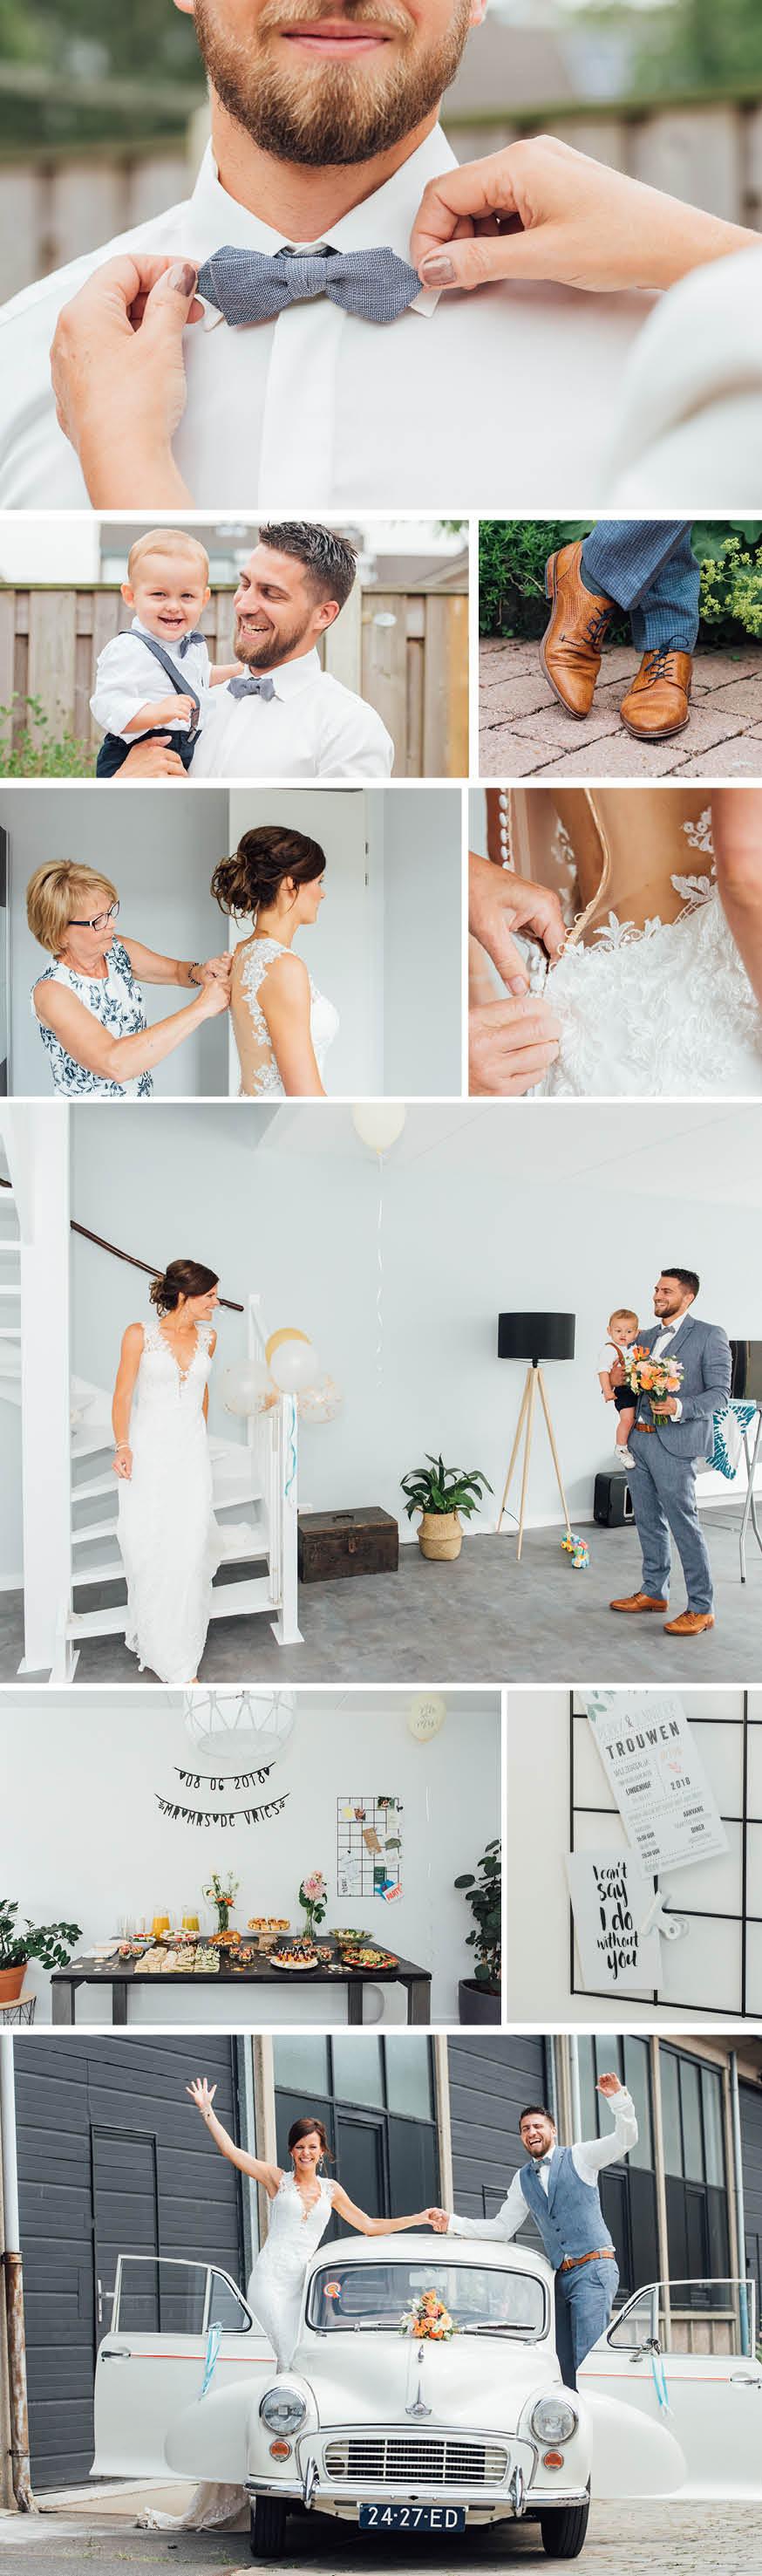 Bruiloft S&P